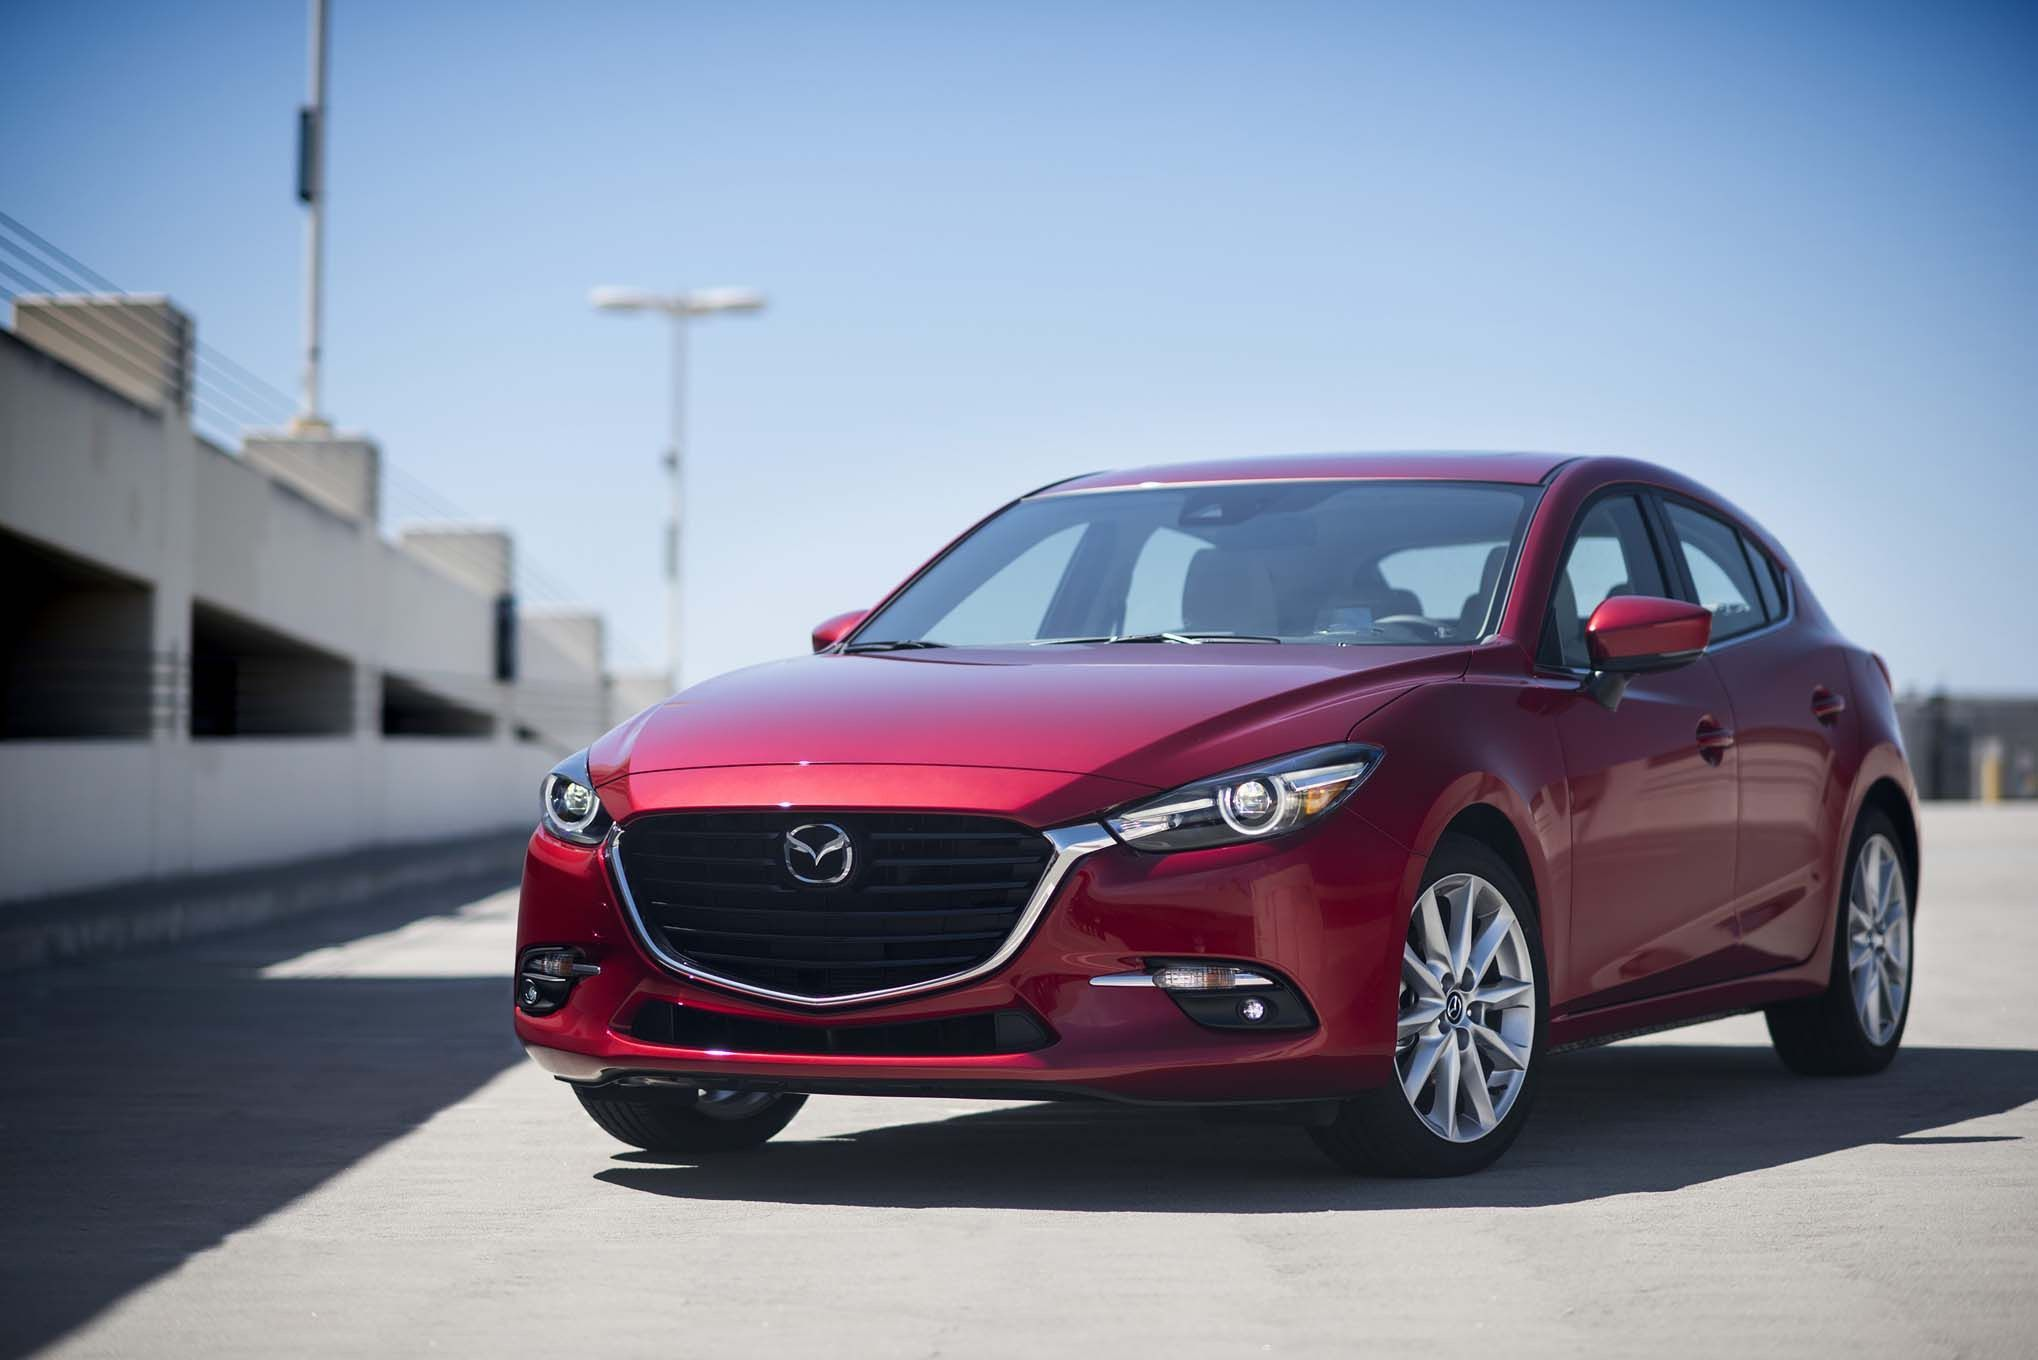 Mazda 3 2020 Qatar First Drive Di 2020 Dengan Gambar